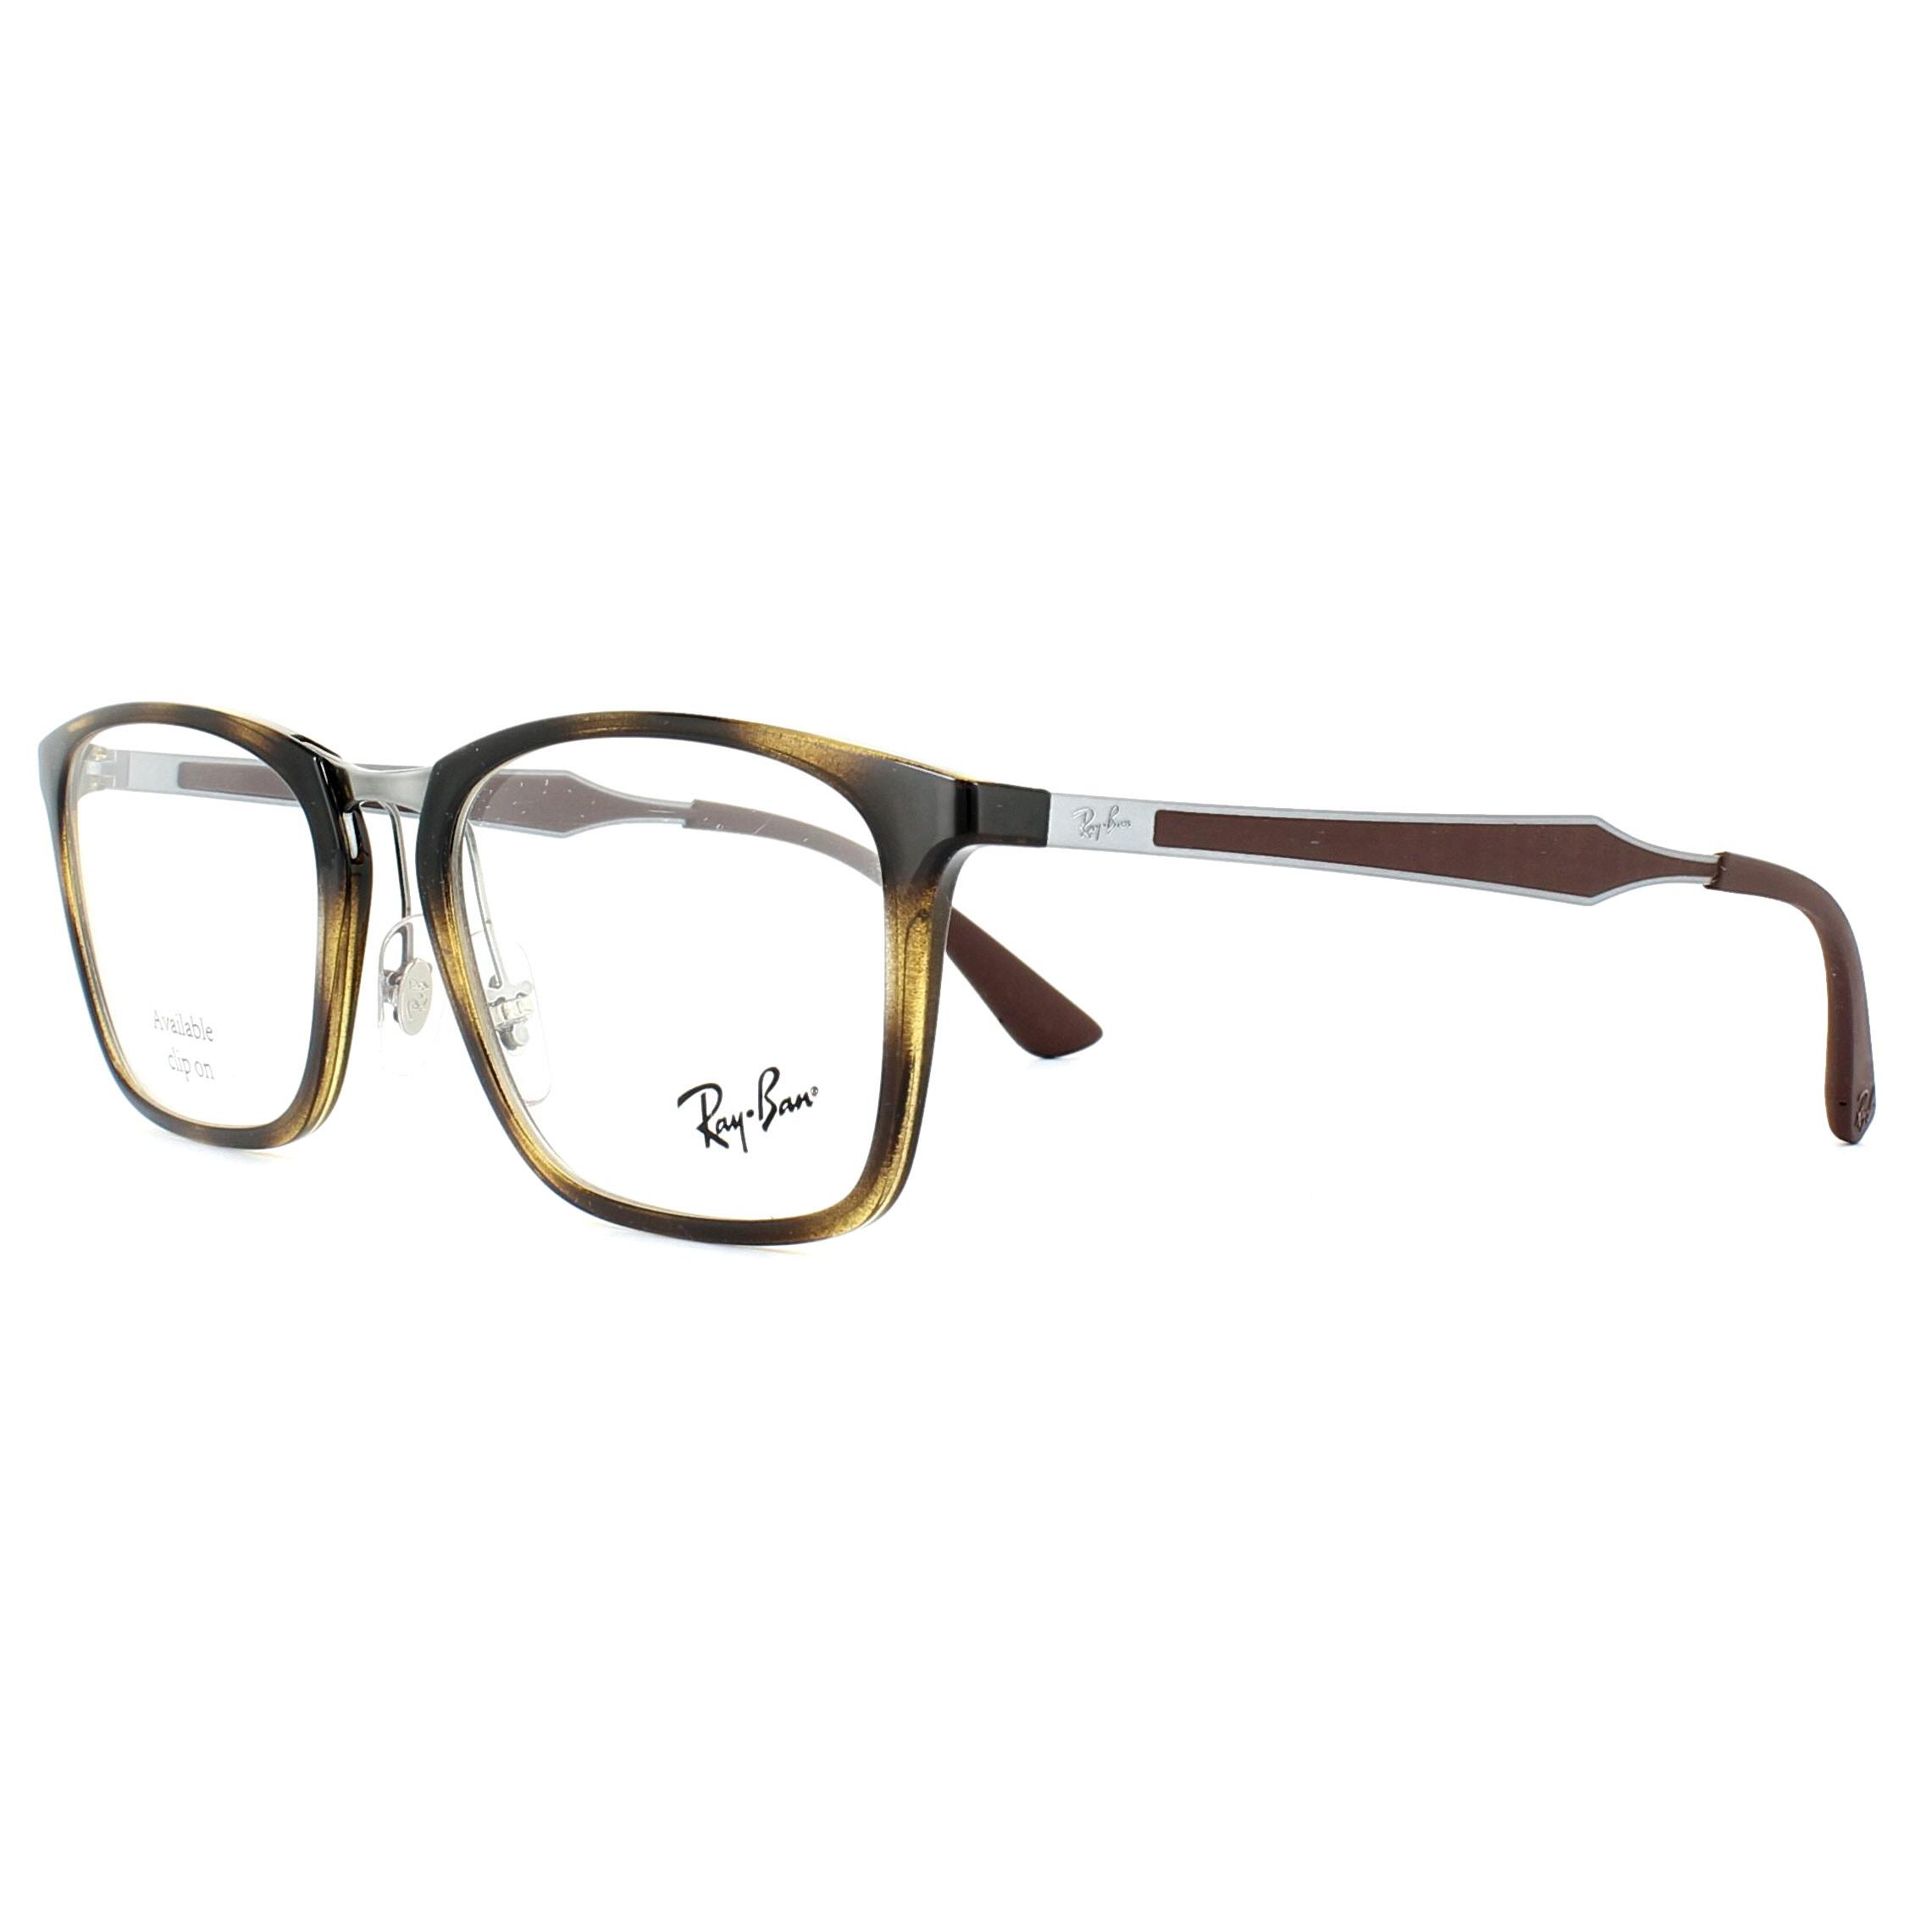 f943bba849 Ray-Ban Glasses Frames 7131 2012 Havana 53mm Mens 8053672769227